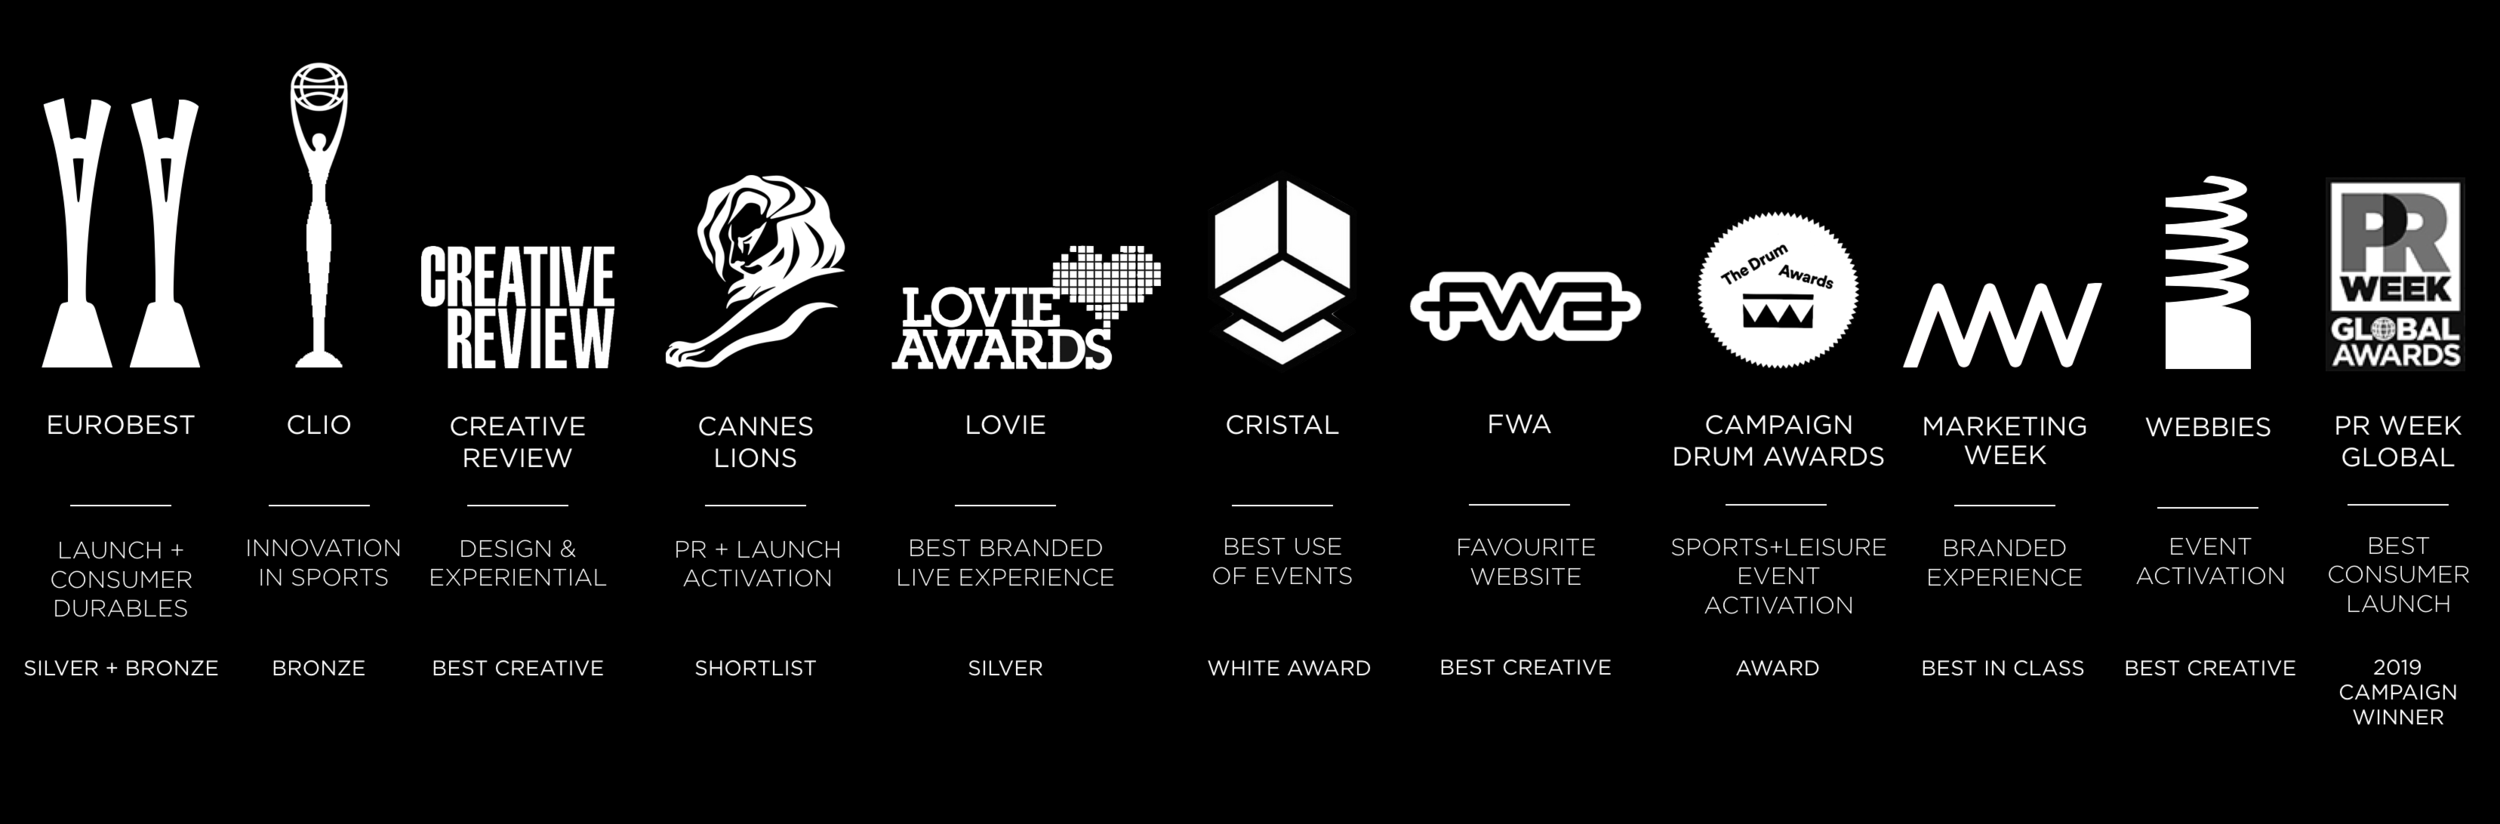 Awards_asics blackout